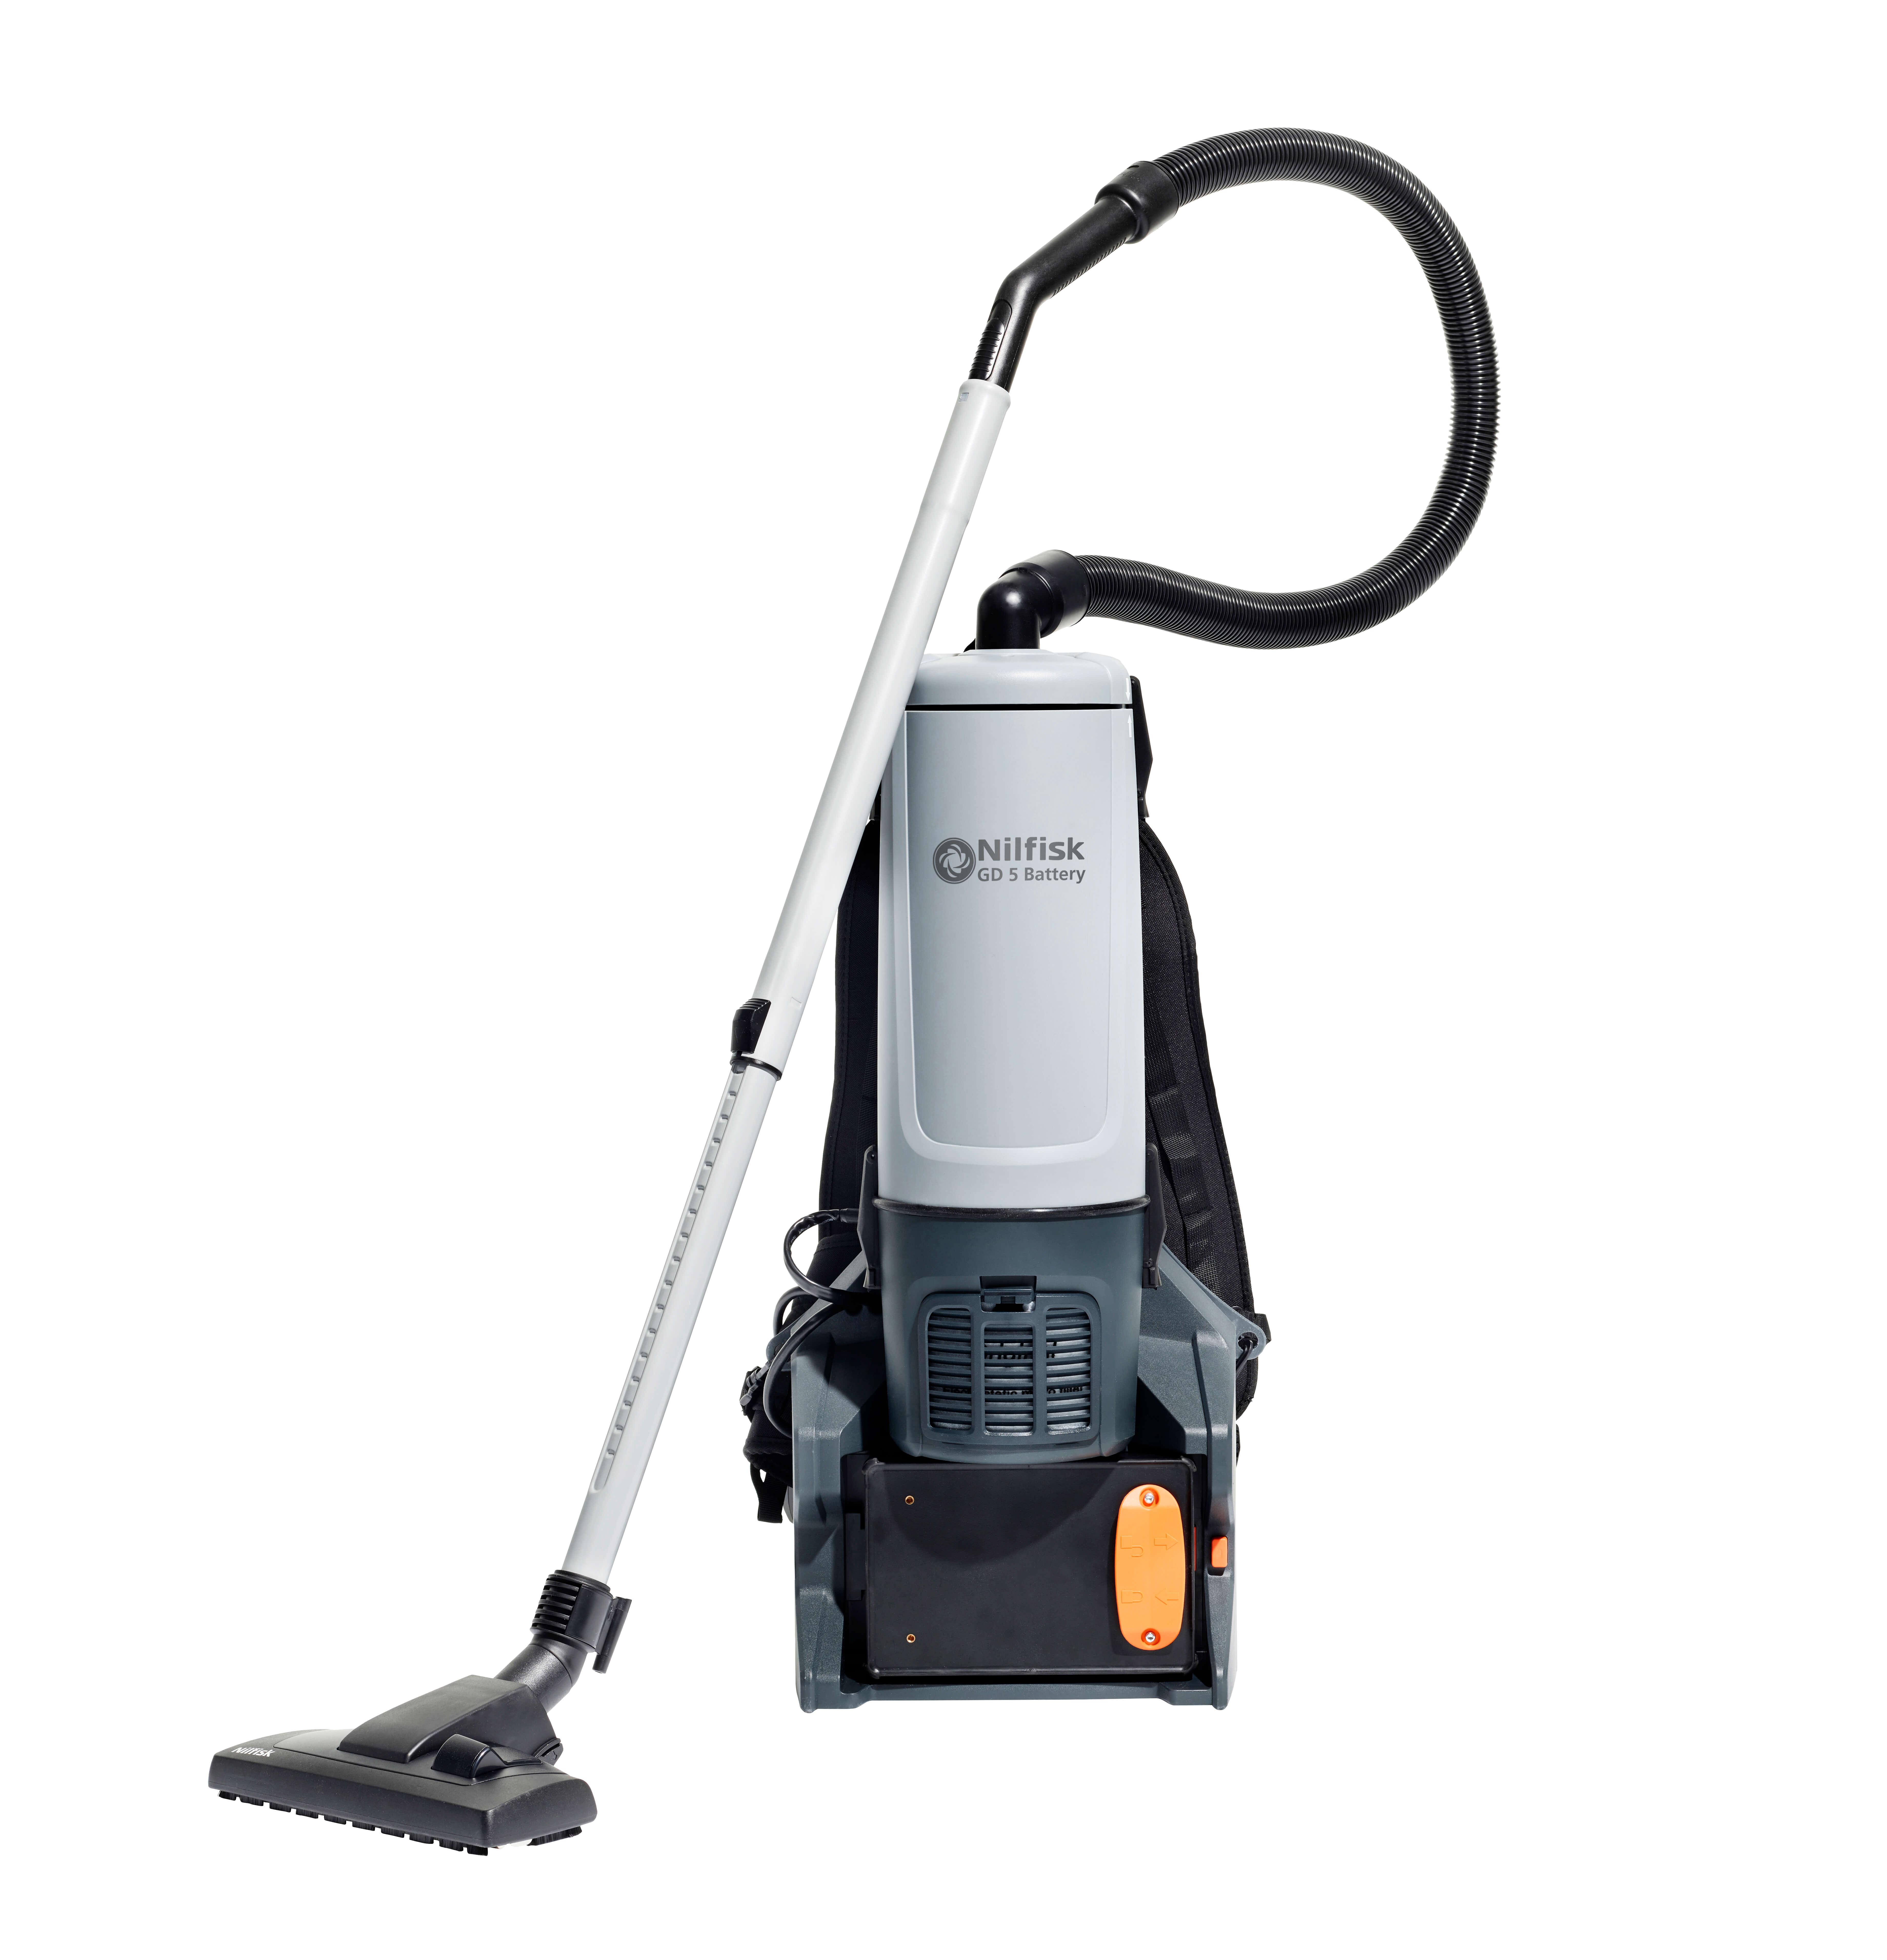 Cordless battery vacuum